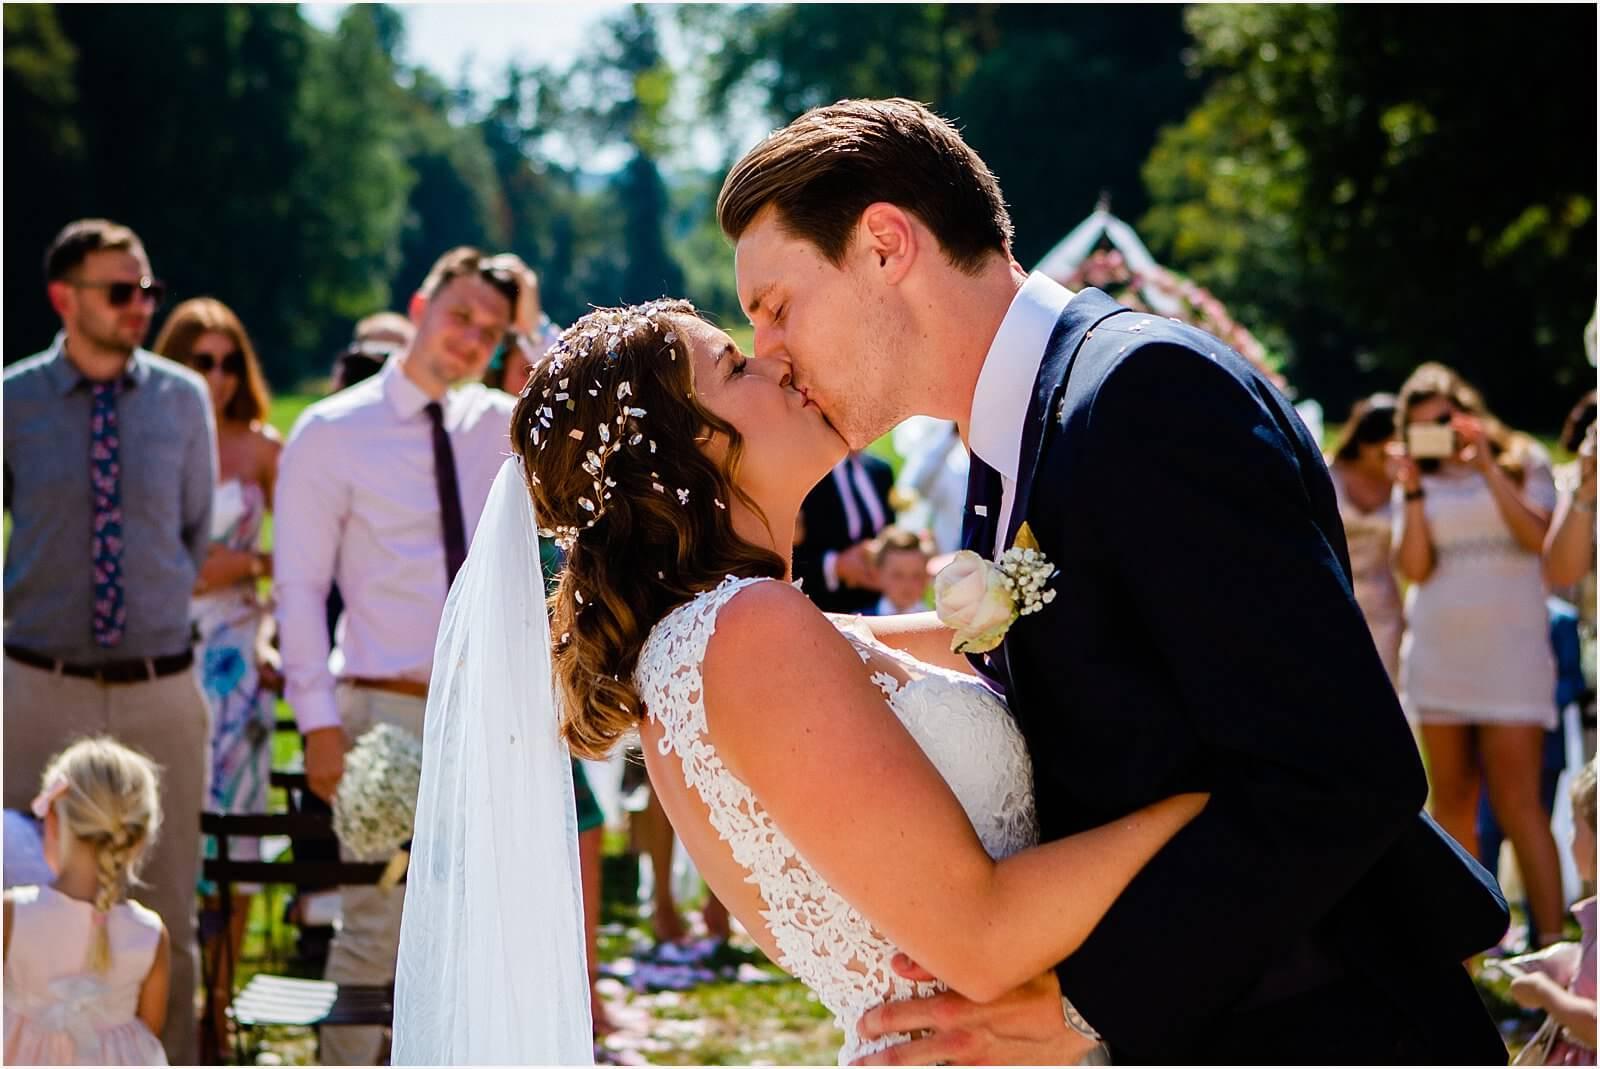 Chateau de Courtomer Wedding | Chantel & Evan 31